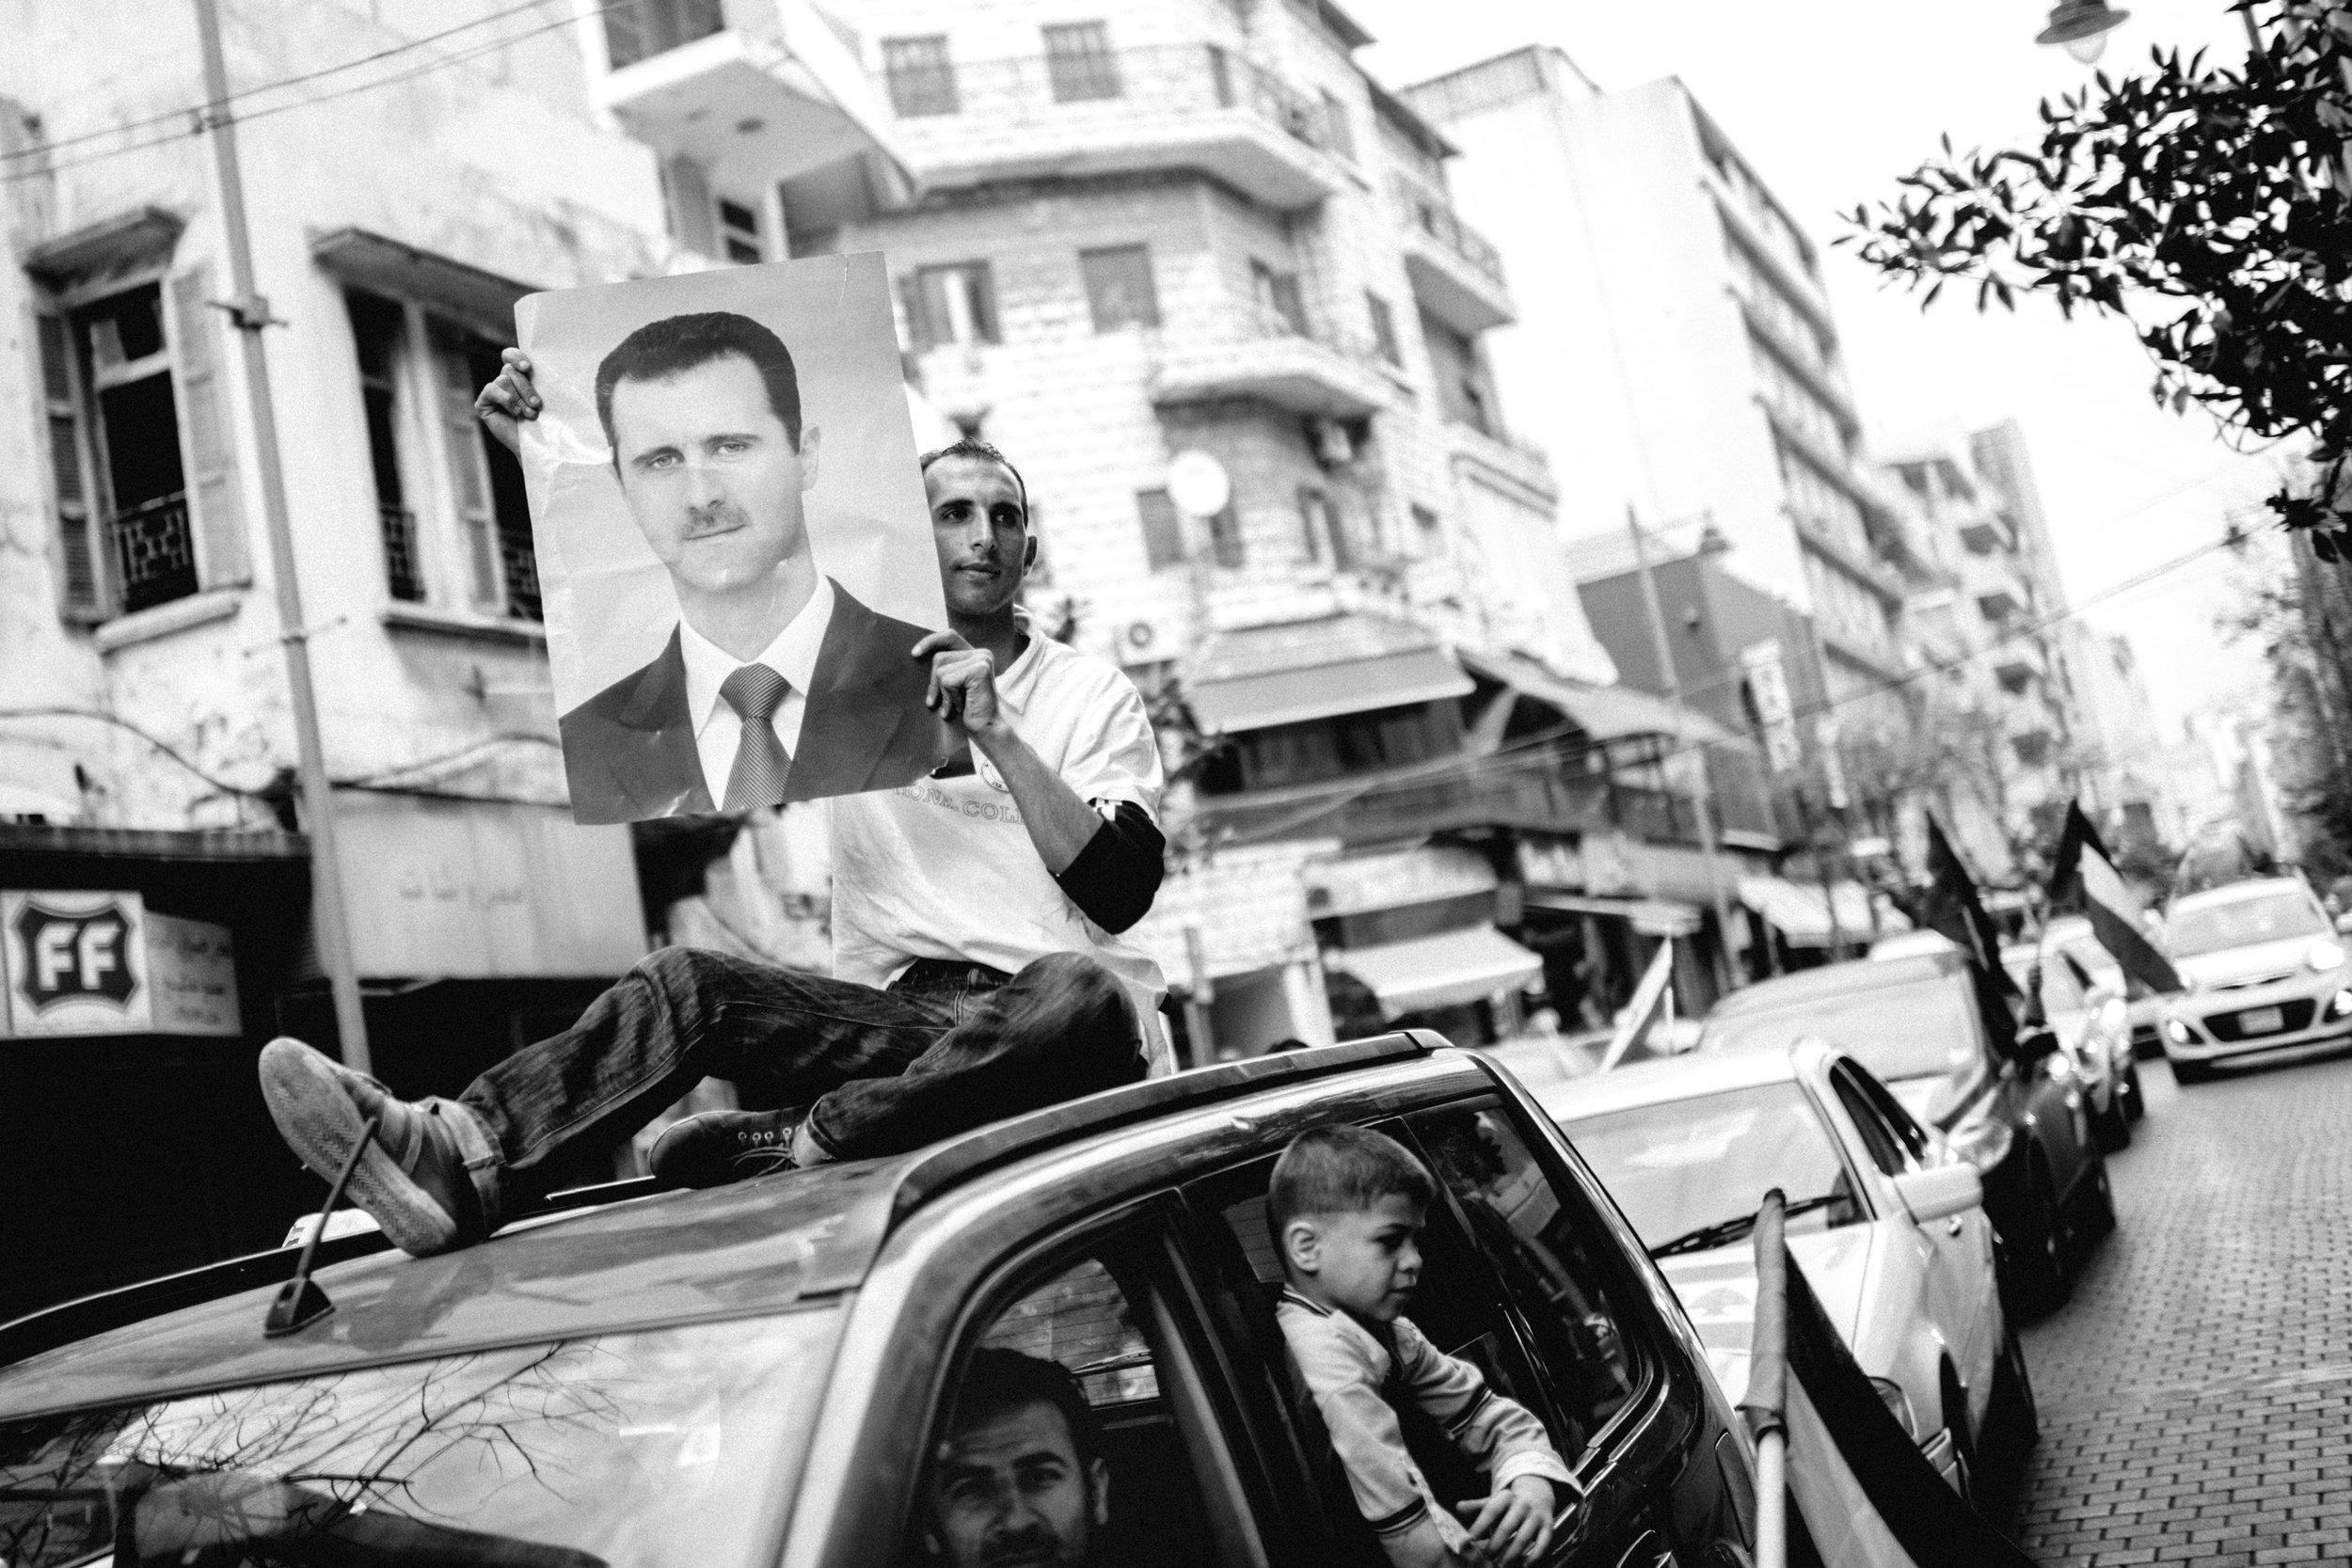 syria_bw_new_web_027.JPG